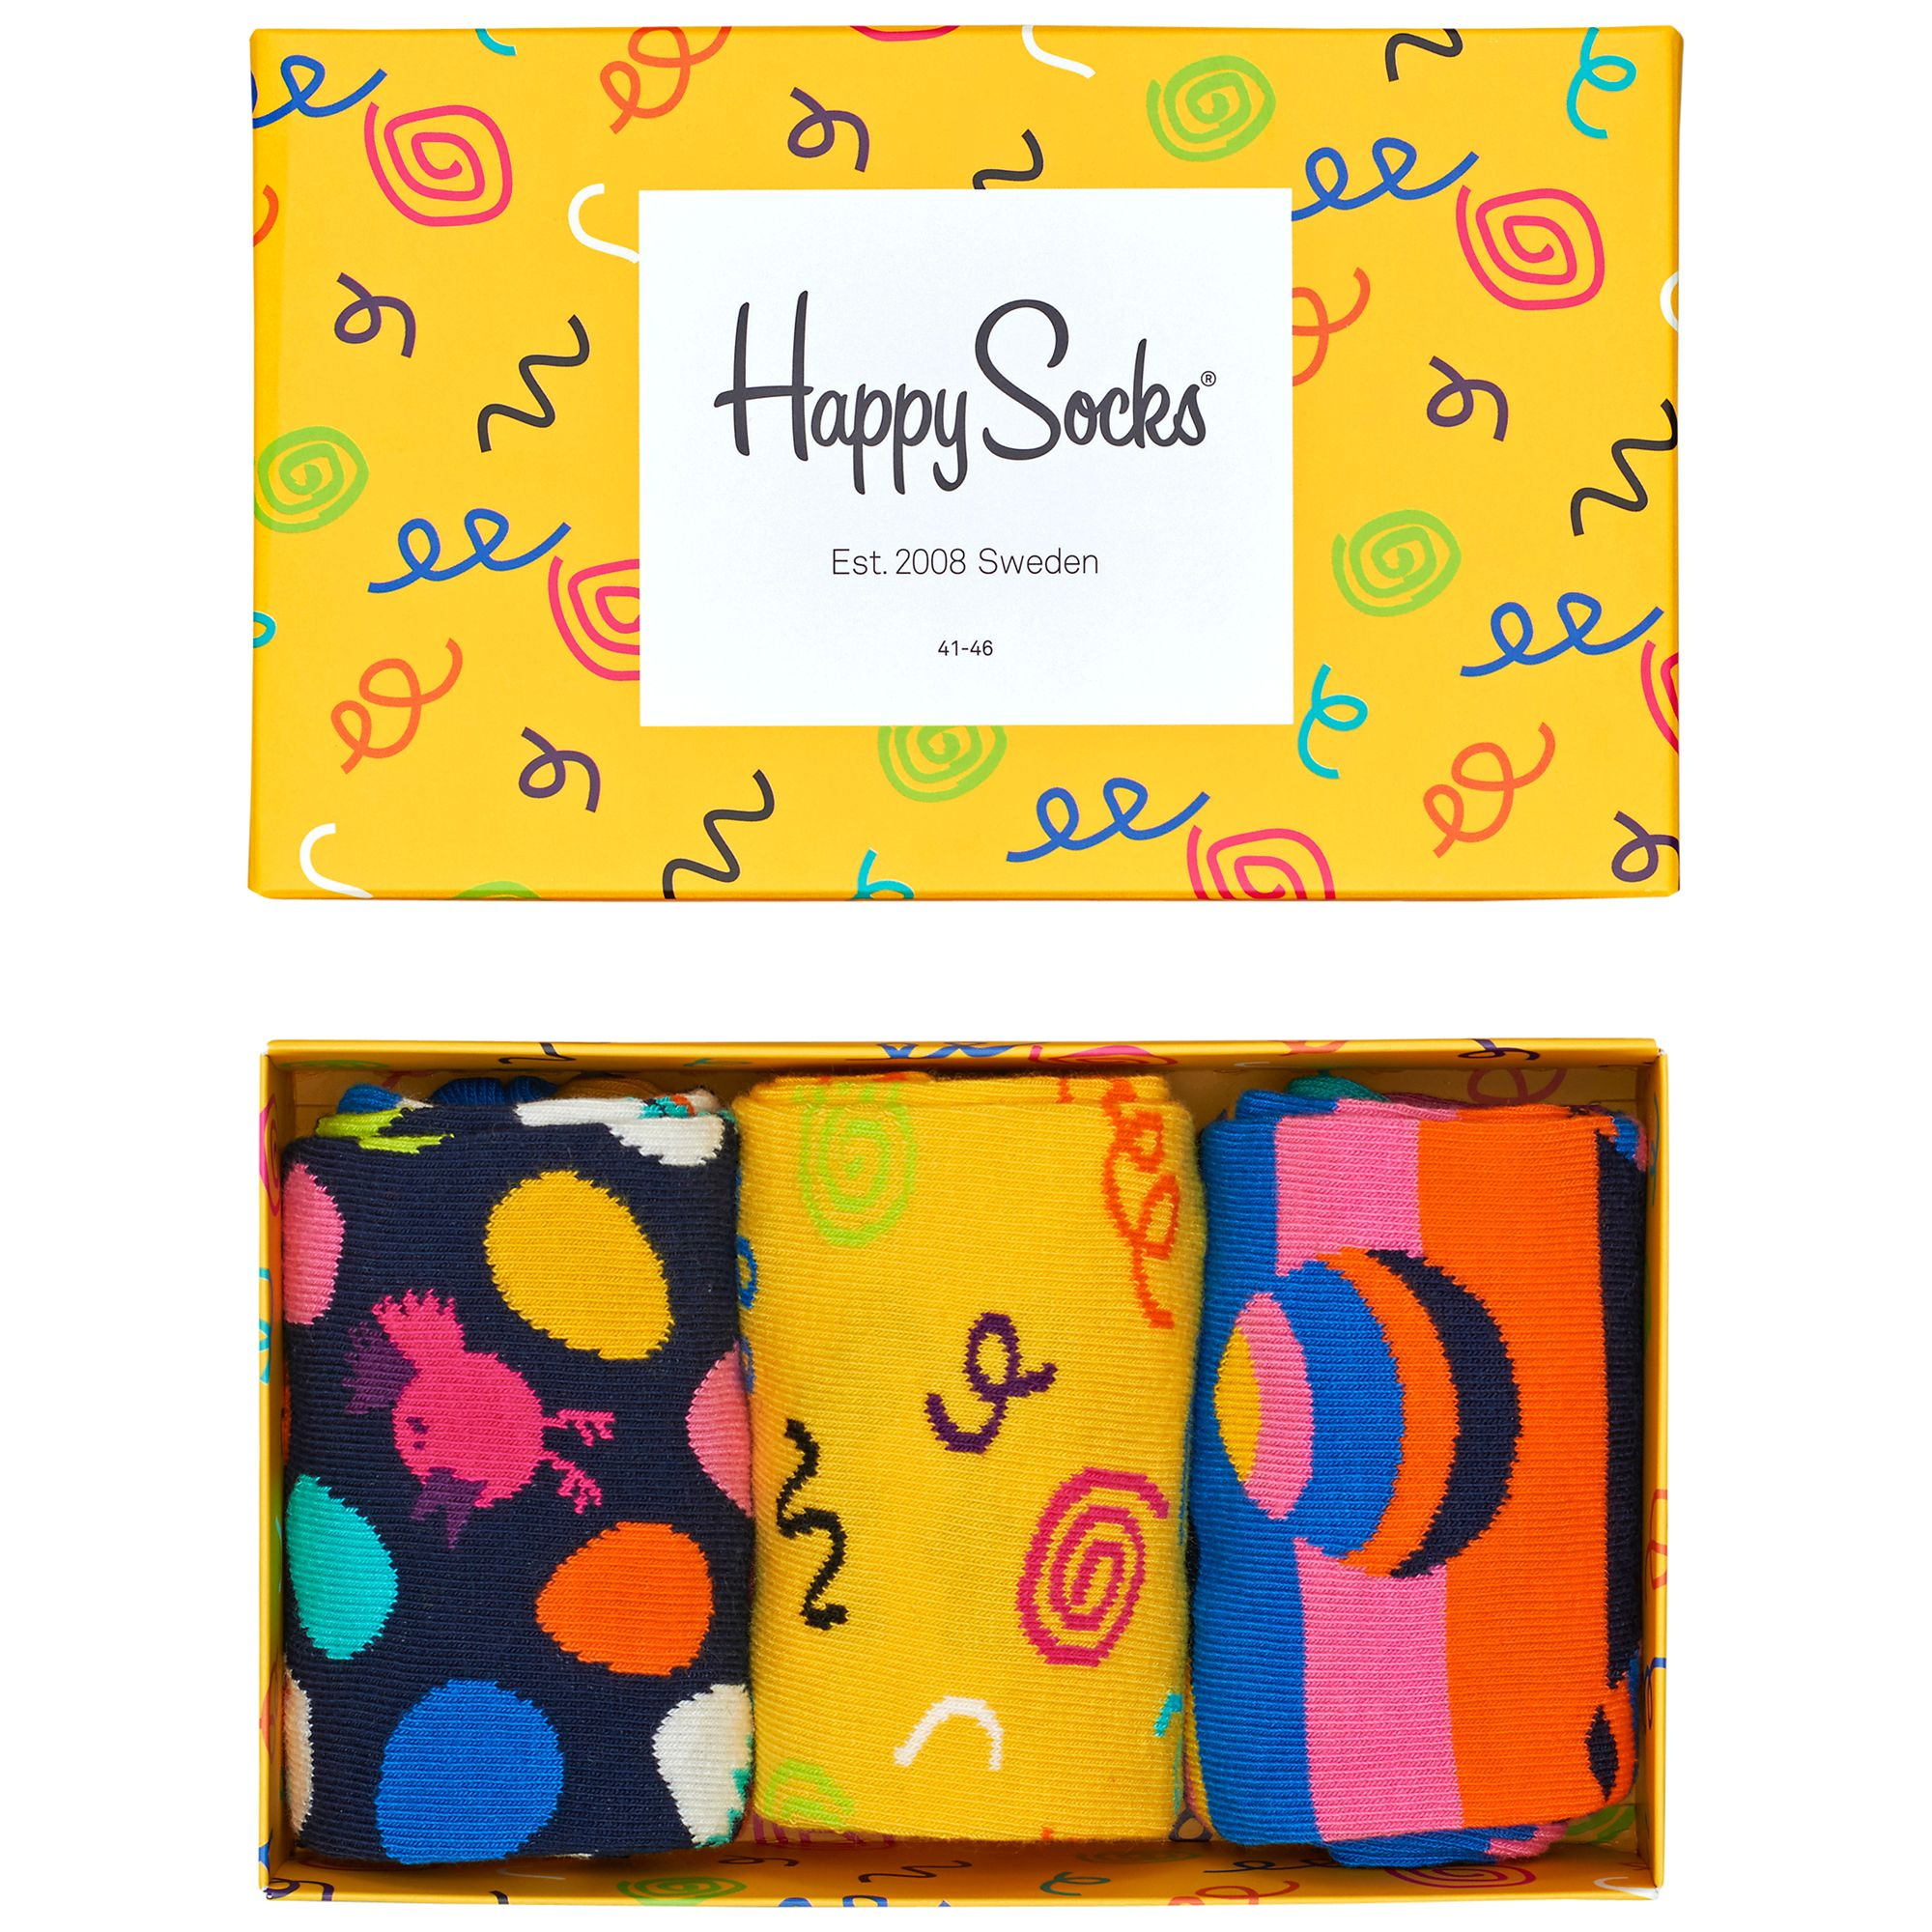 Happy Socks Happy Socks Easter Socks Gift Box, Pack of 3, One Size, Multi